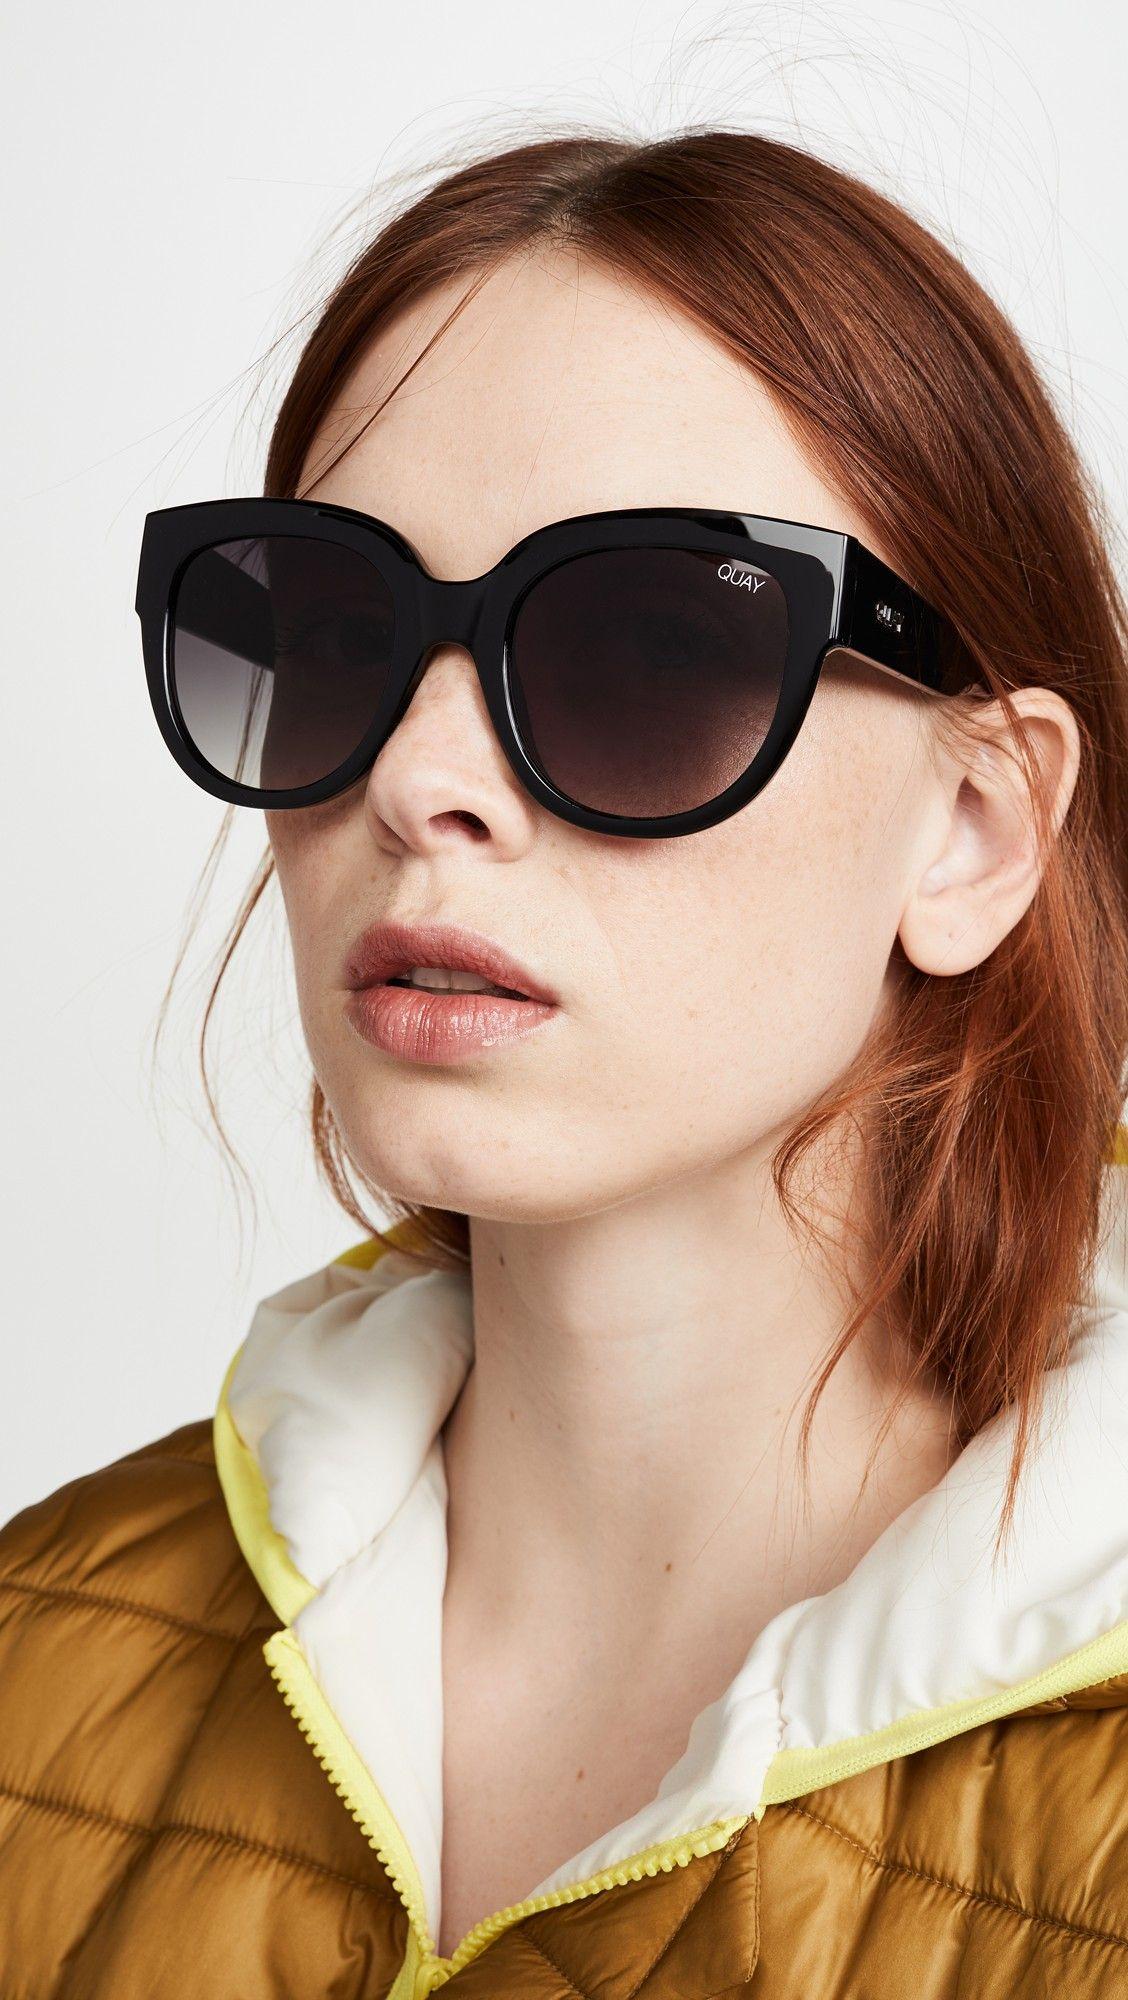 Quay Limelight Sunglasses In 2020 Quay Sunglasses Quay Sunglasses Shay Sunglasses